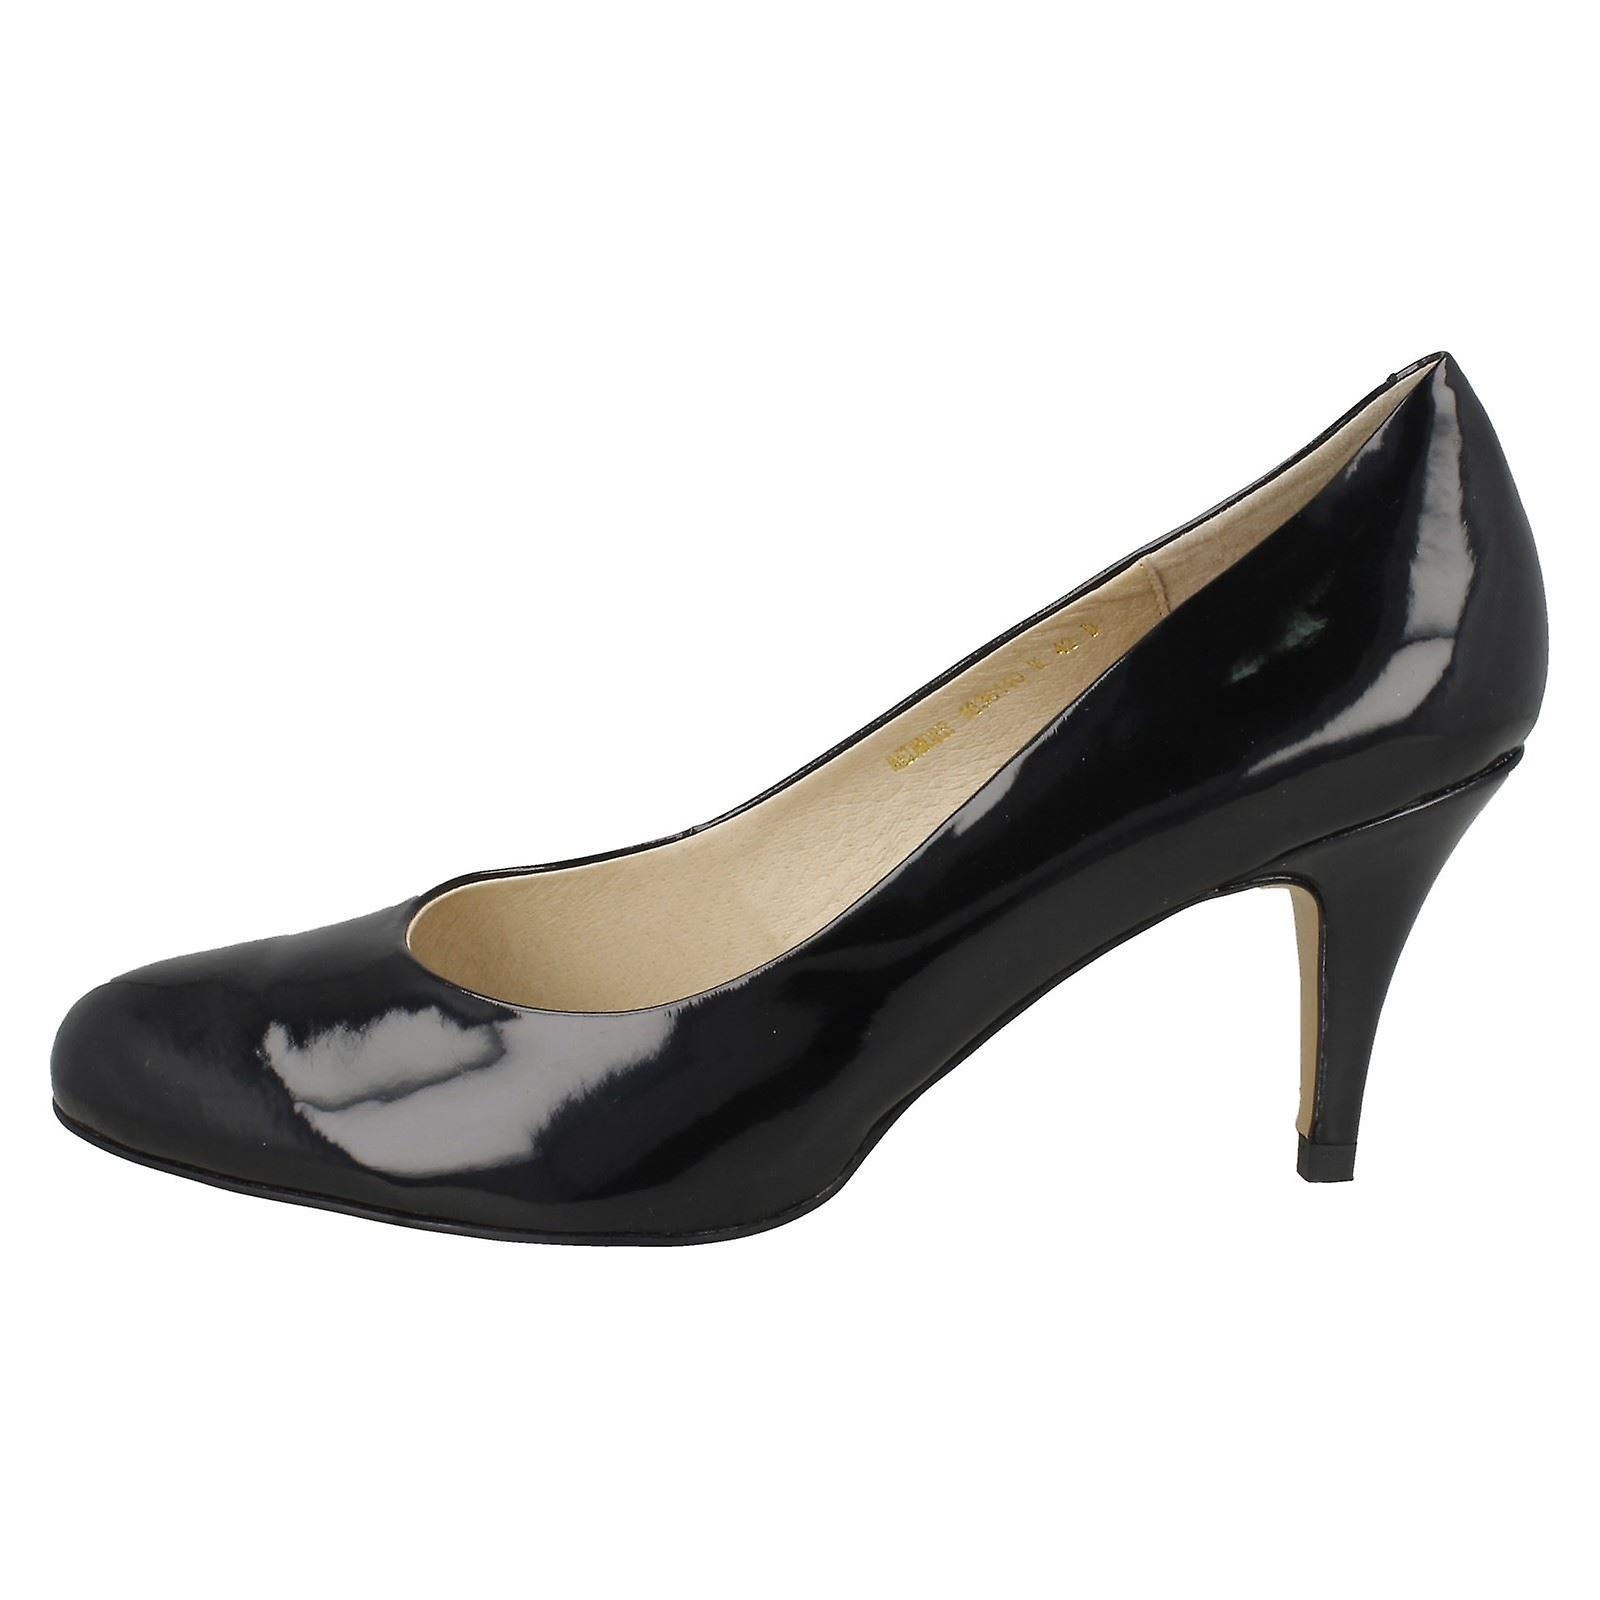 Shoes Heeled Wedmore Dal Ladies Van 1awqZqtB